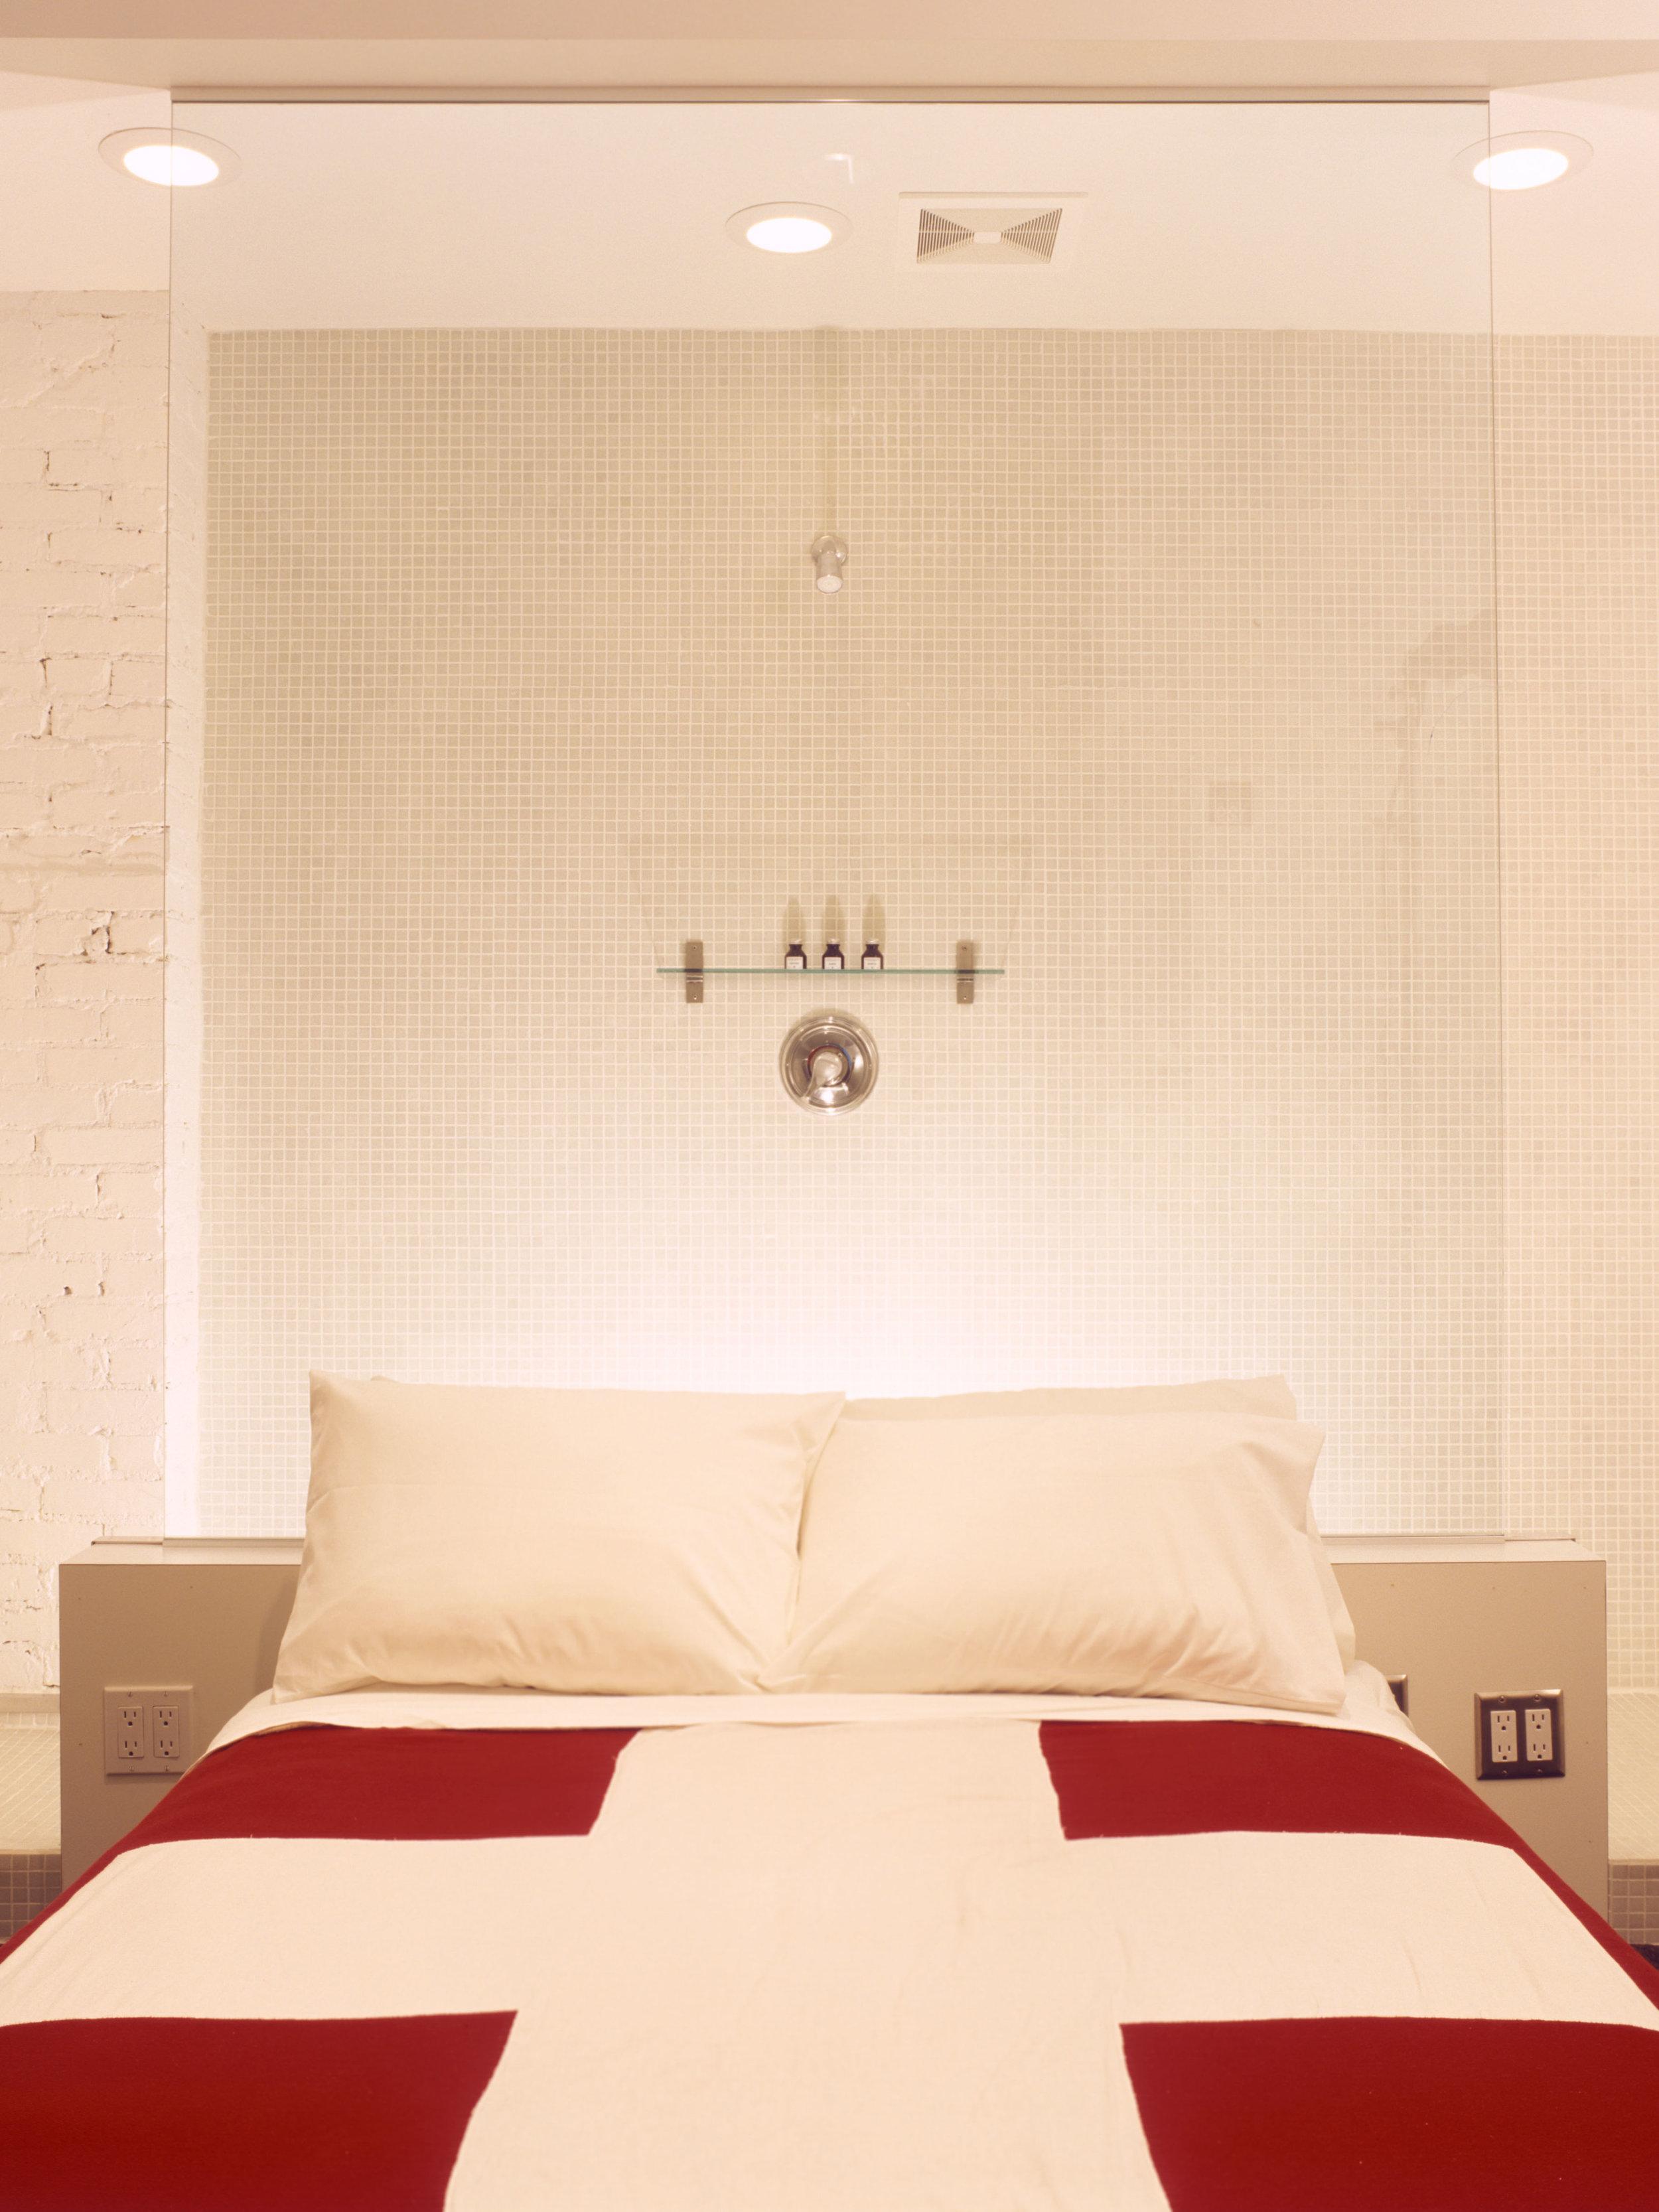 new rooms, jim henkens jpeg002.jpg